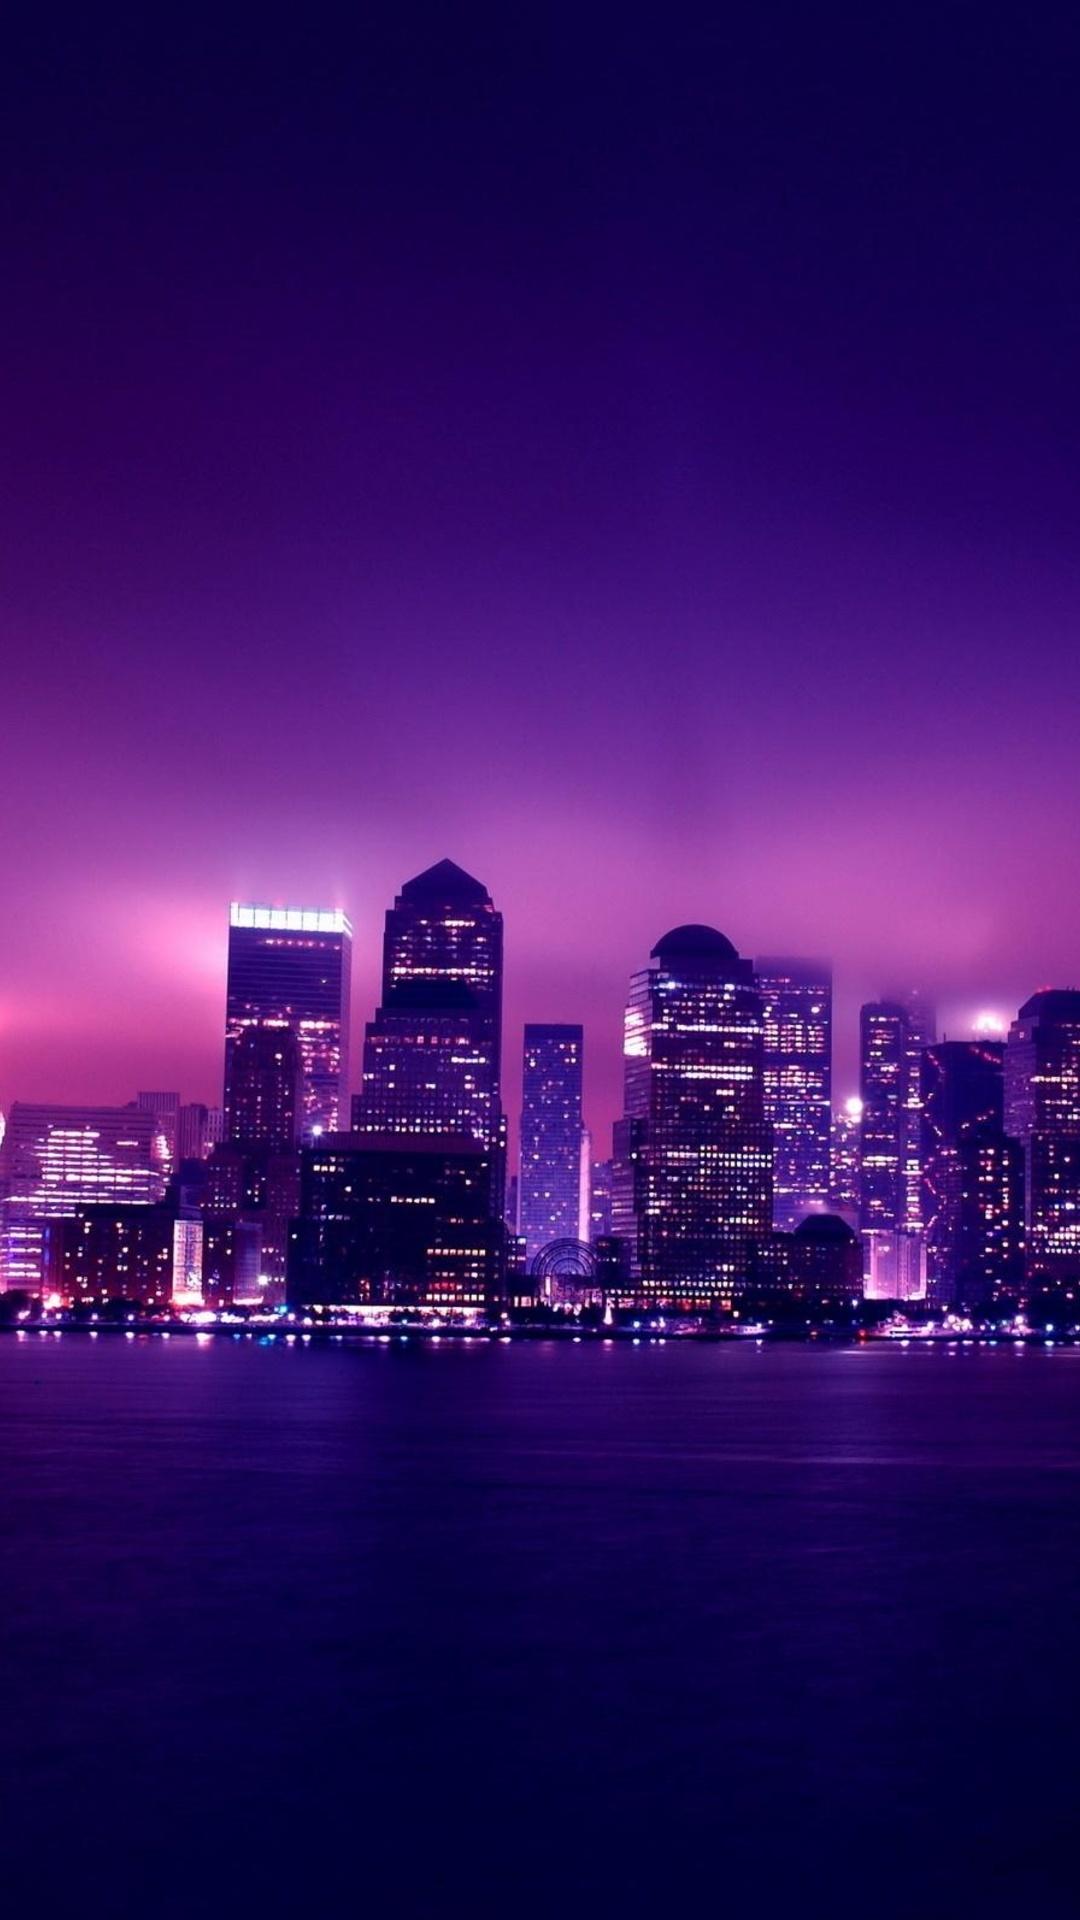 Great Wallpaper Aesthetic Iphone 7 - aesthetic-city-night-lights-5s-1080x1920  Graphic_534636      .jpg